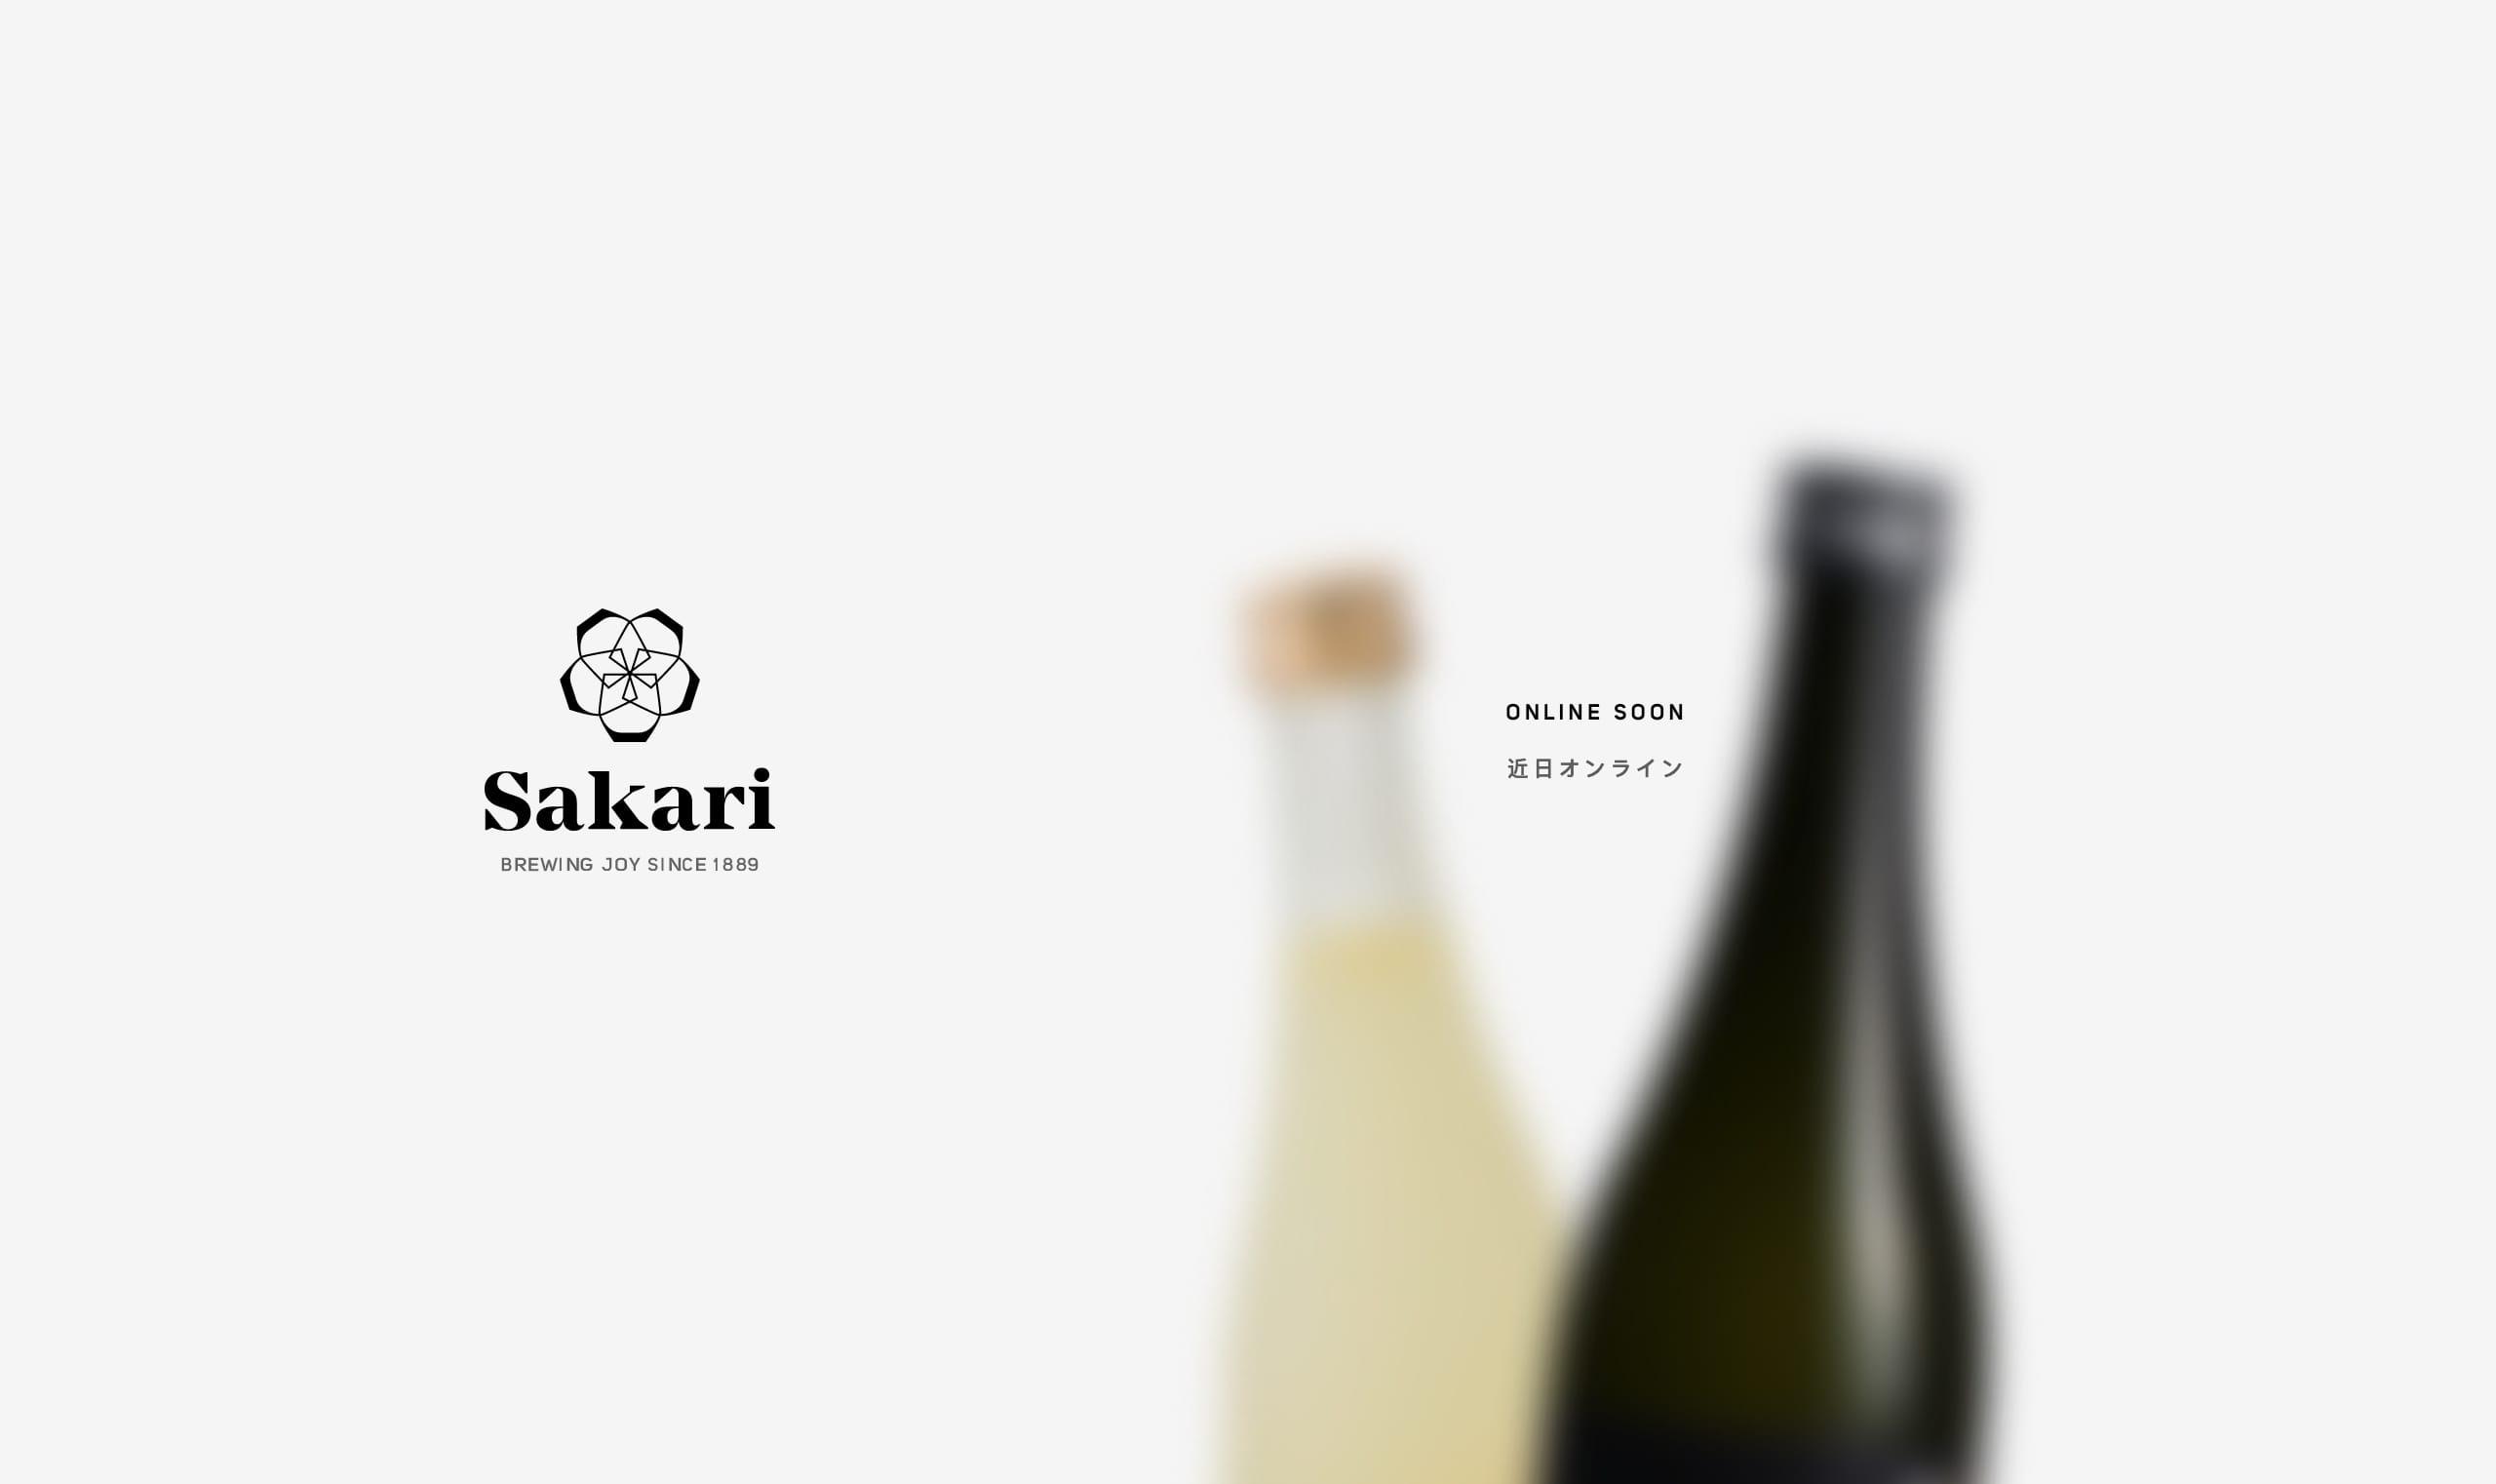 Sakari Website Screenshot